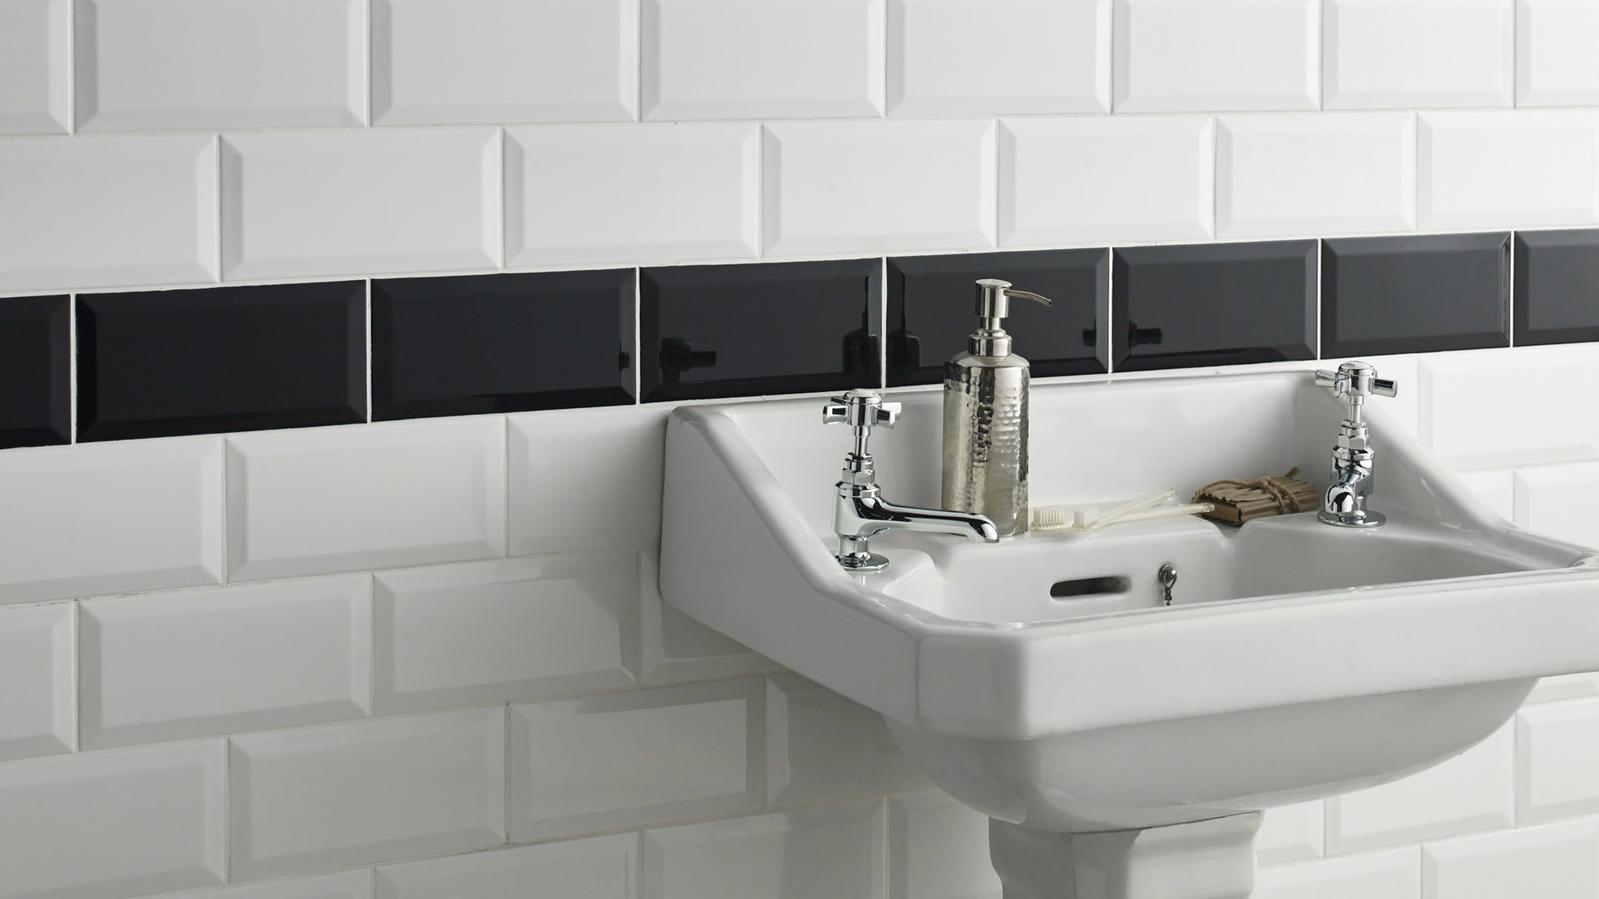 The perfect tiles for a scandinavian style bathroom tile Perfect tiles